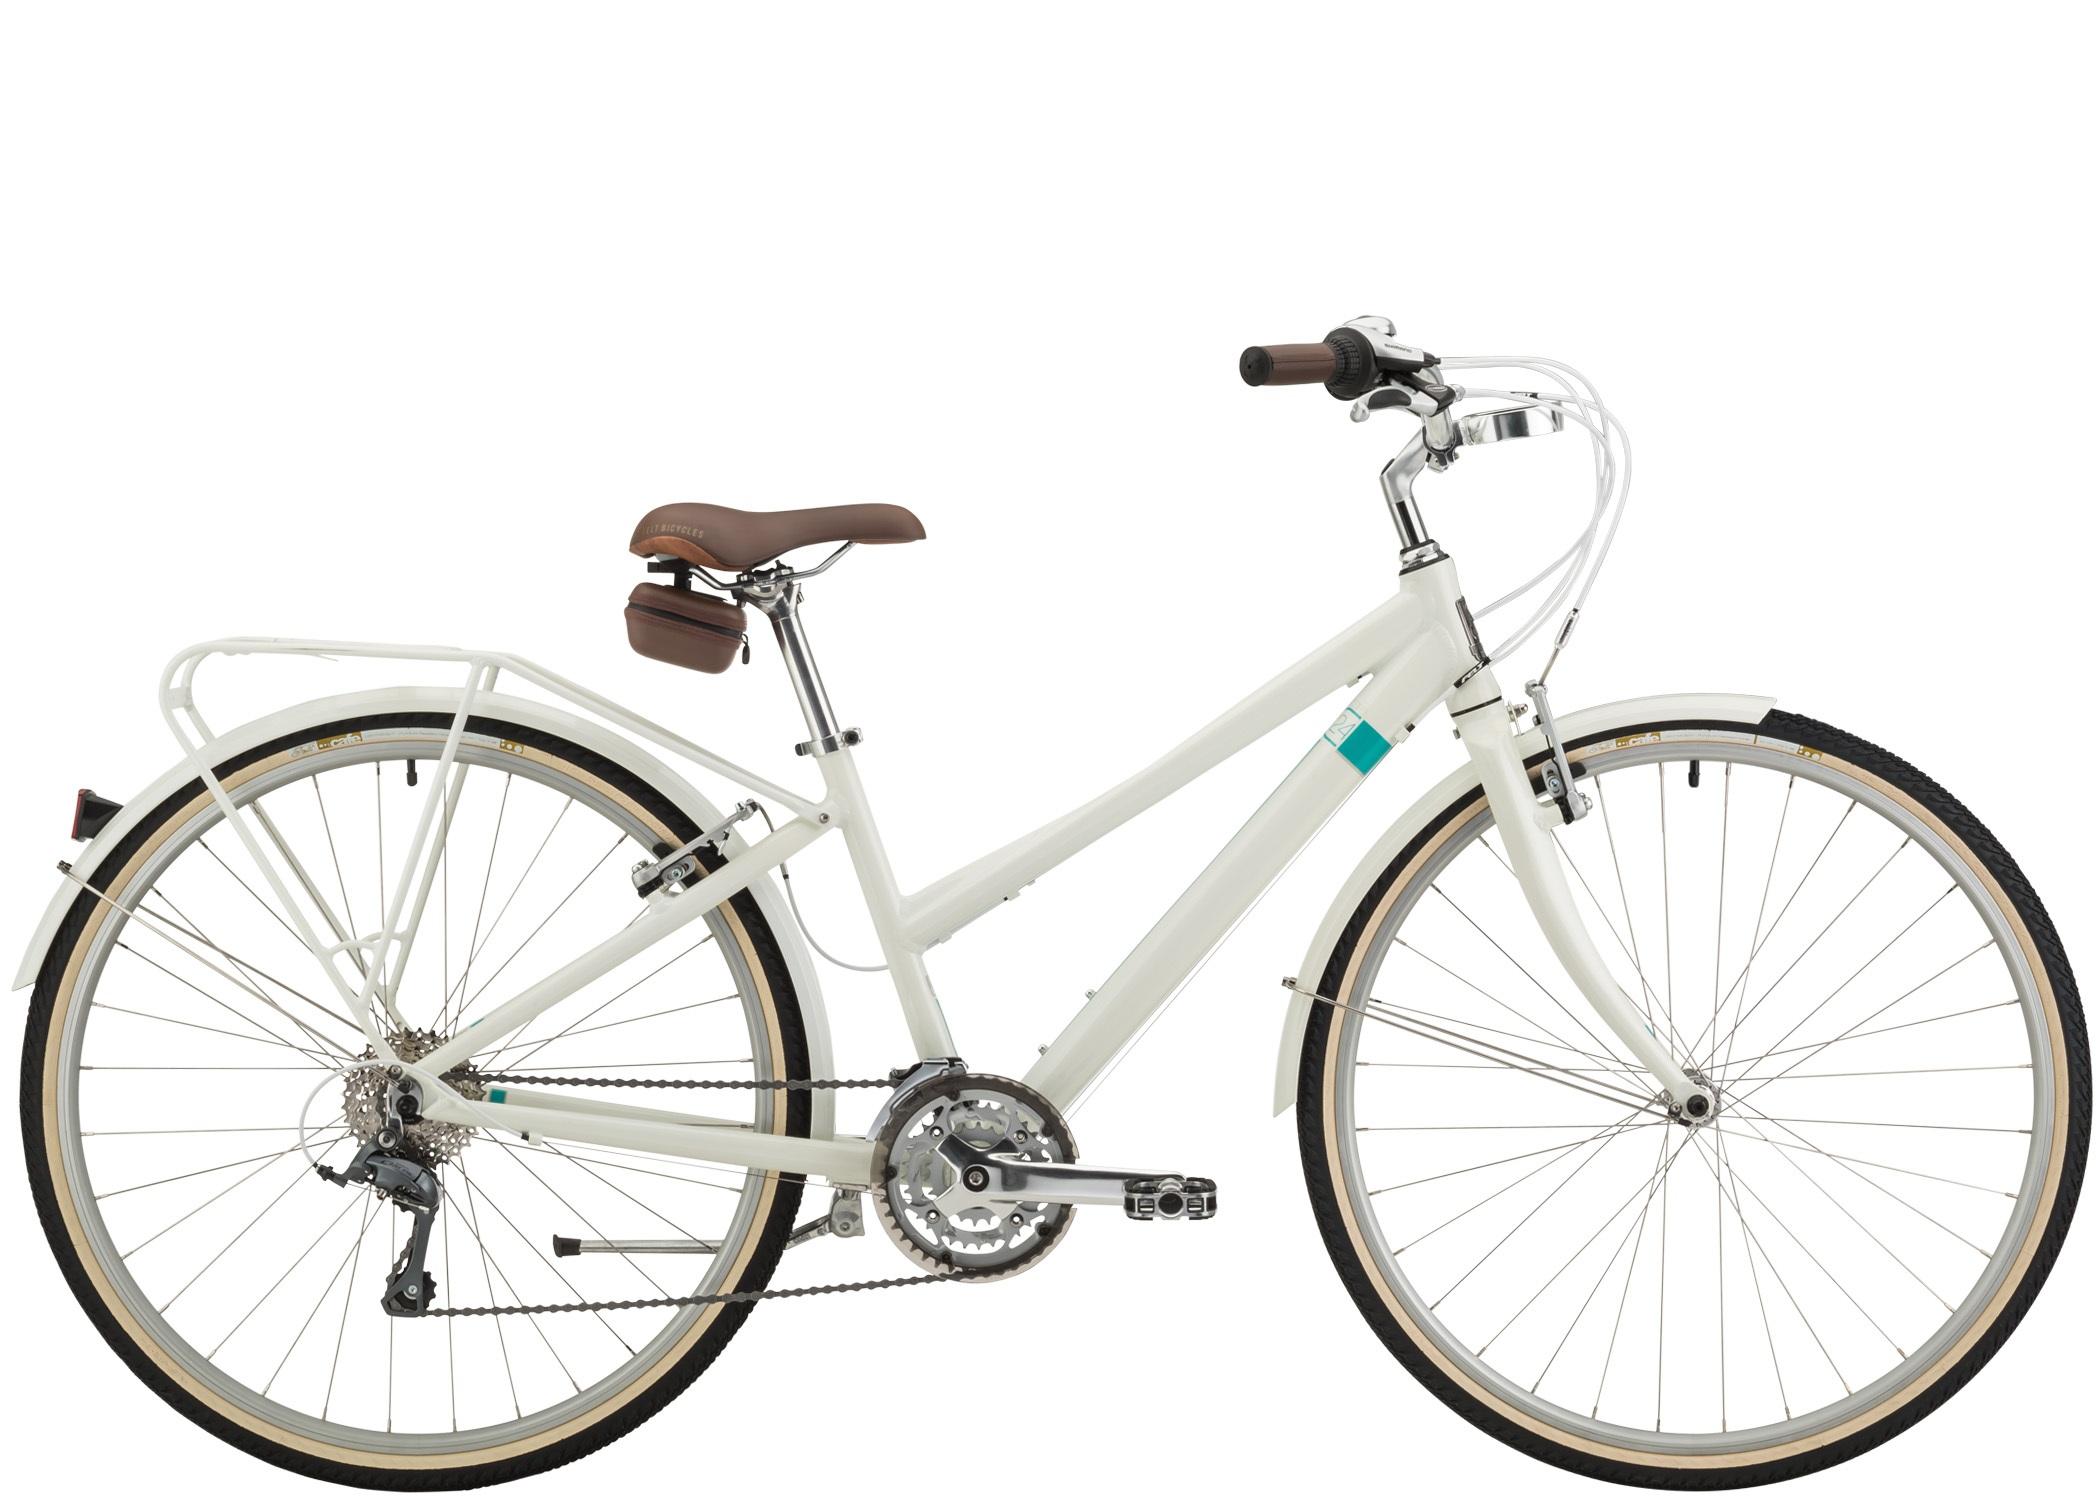 Felt_Bicycles_2016_Verza_Cafe_24_W_USA_Cream.jpg